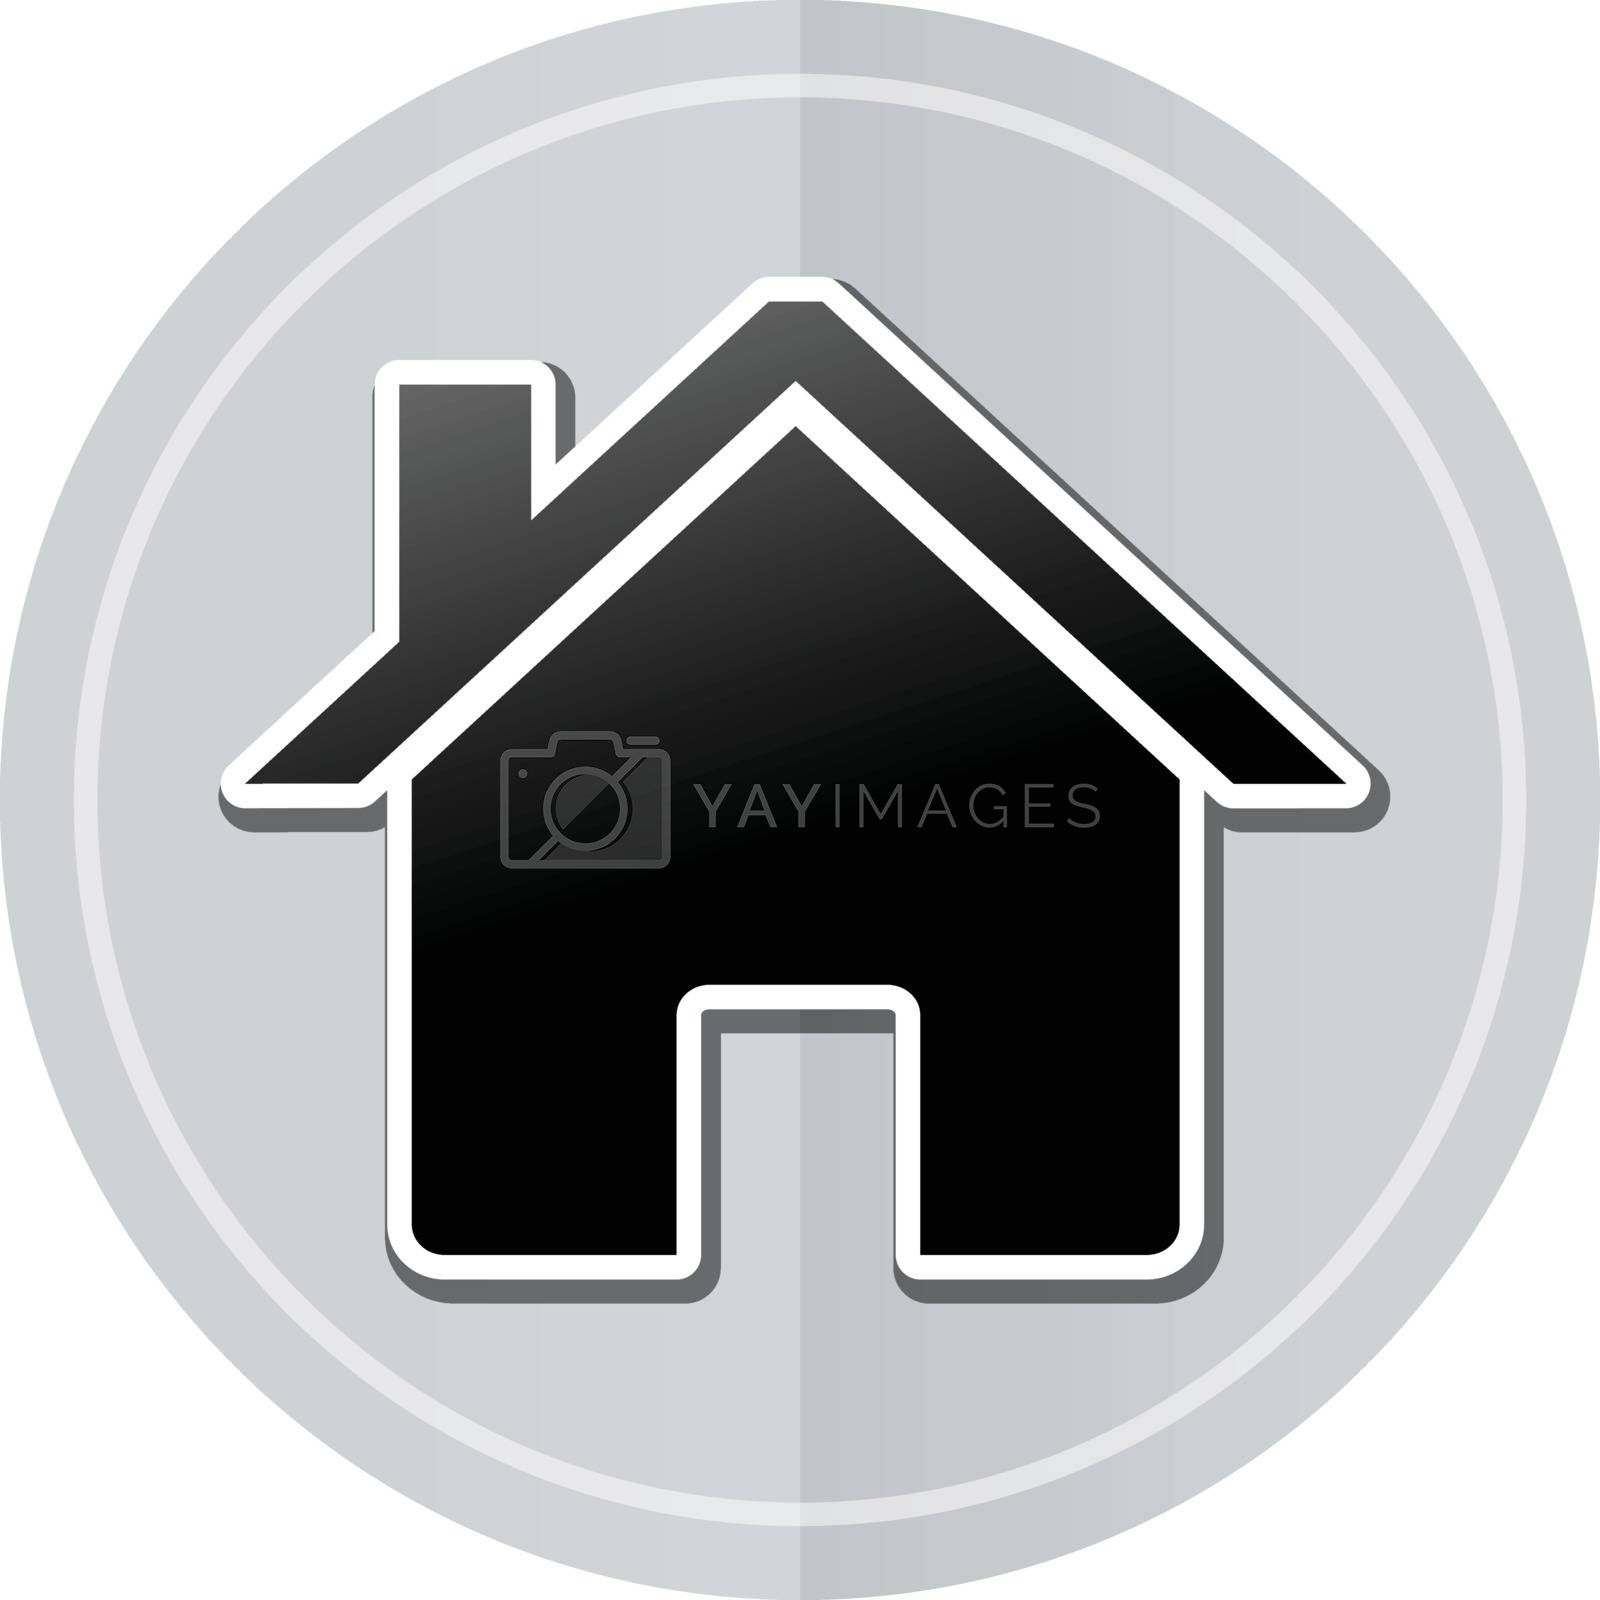 Illustration of home sticker icon simple design